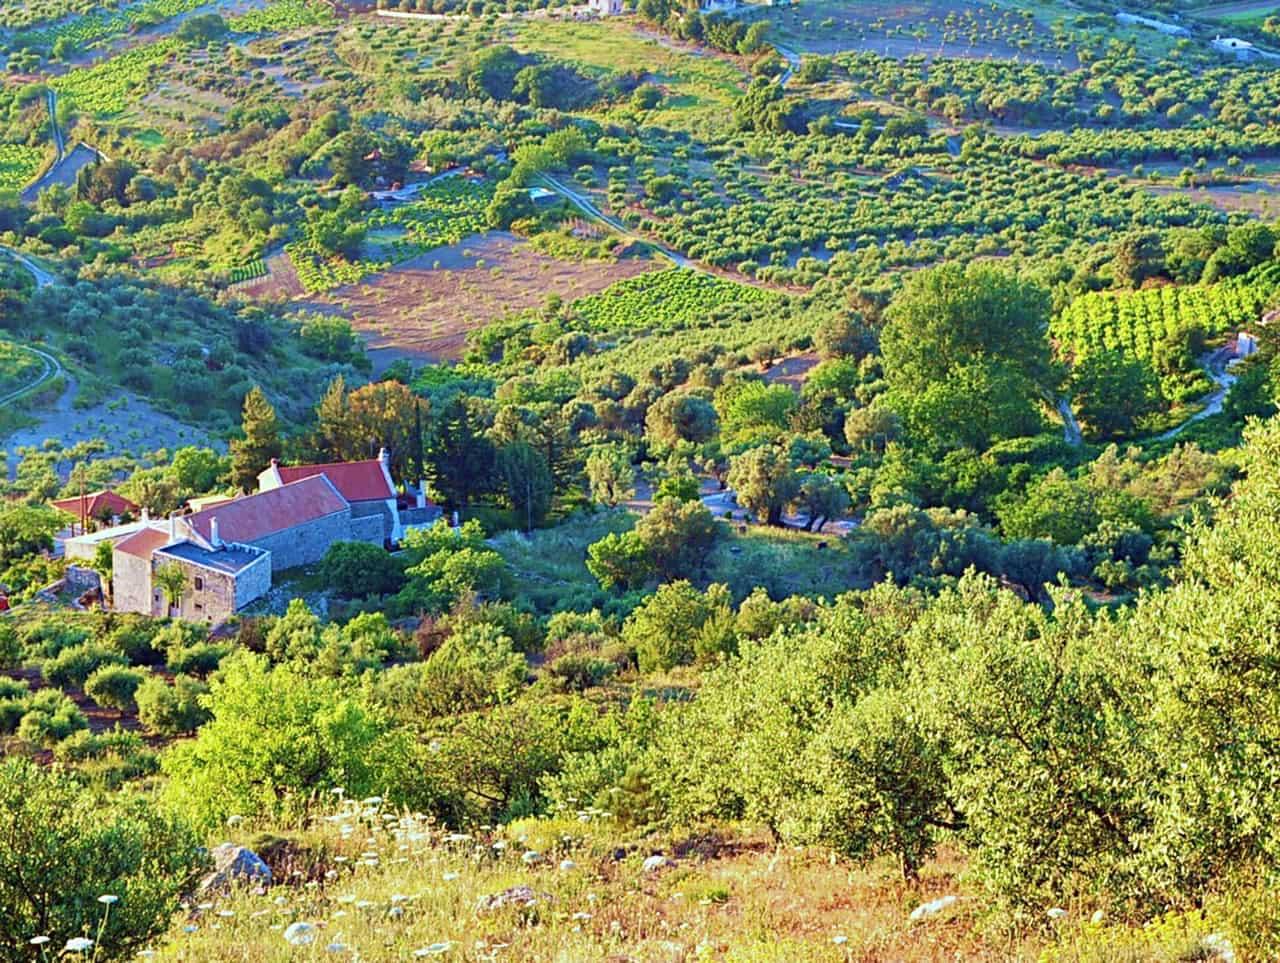 Vlahiana settlement, villages of Kerasia and Venerato, villa kerasia hotel vlahiana, villa kerasia inn venerato village